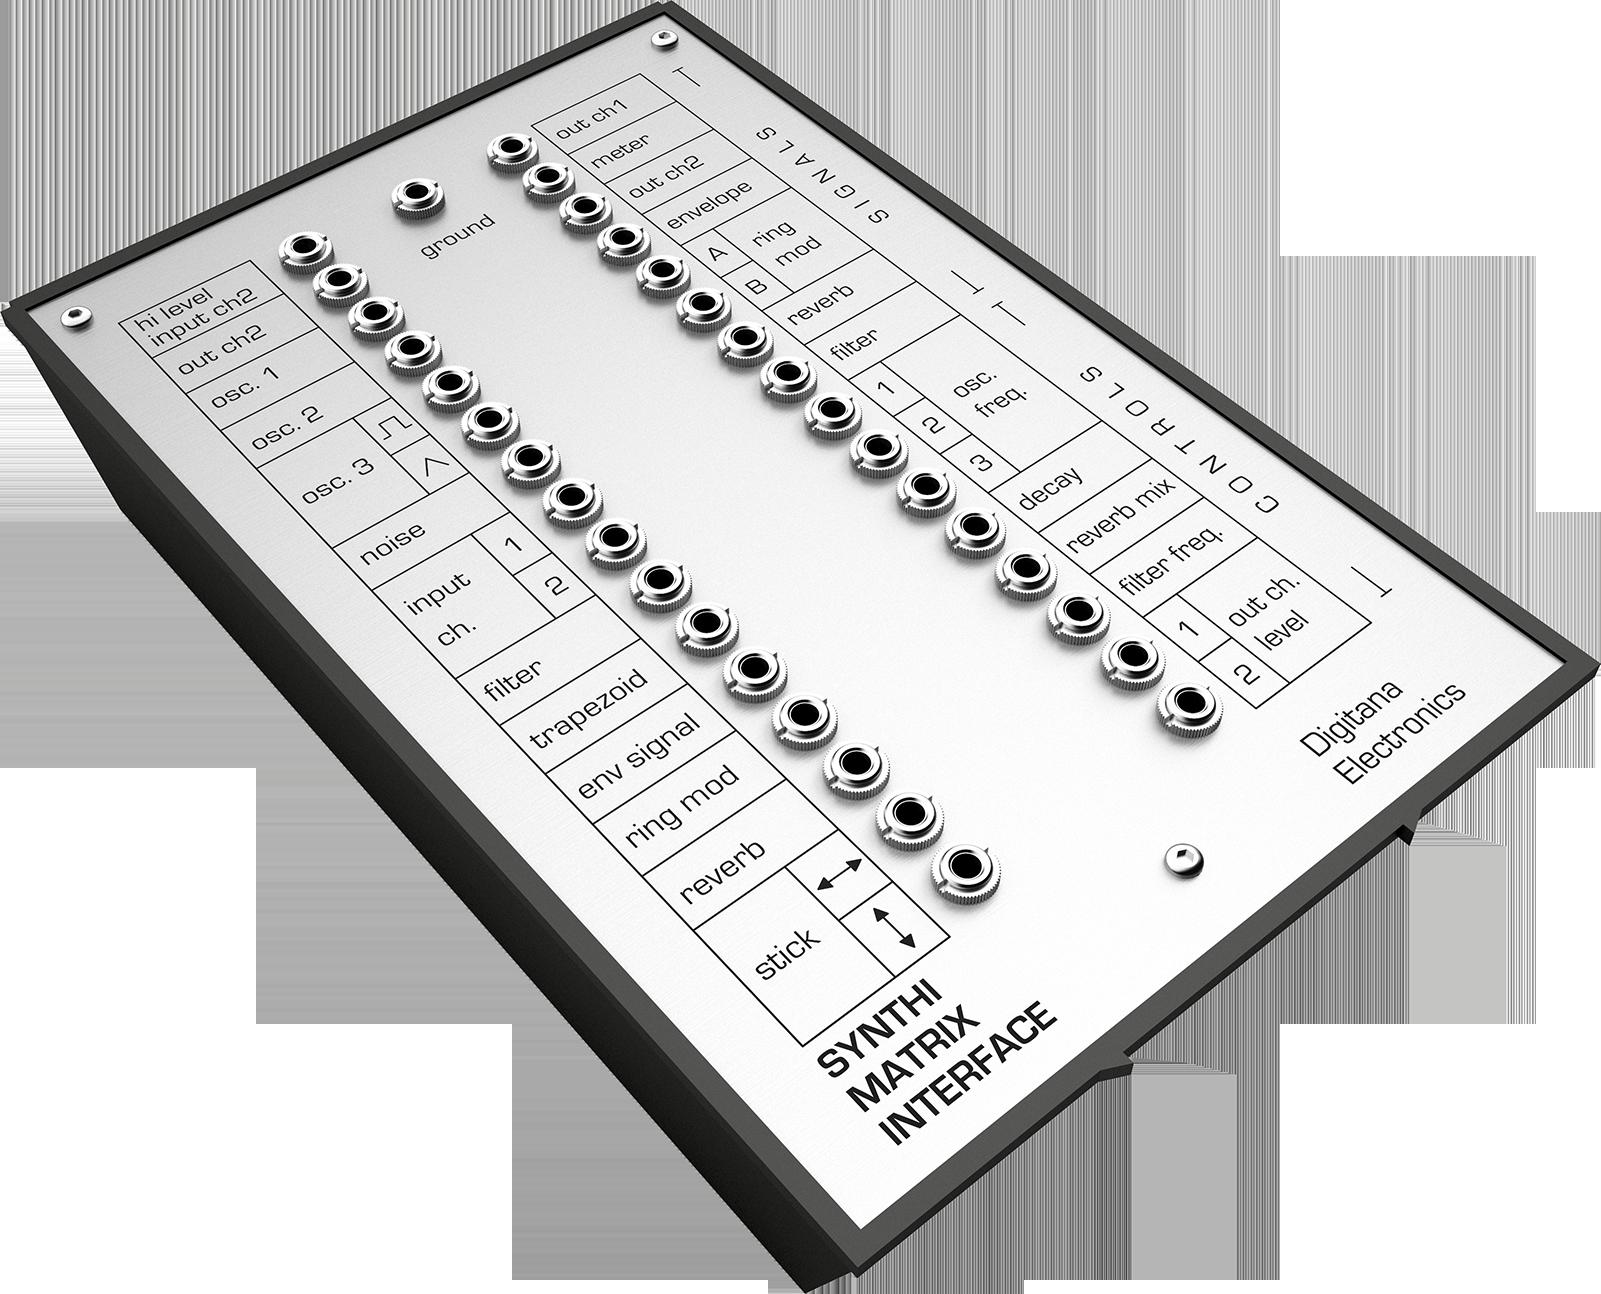 Synthi AKS Matrix Interface